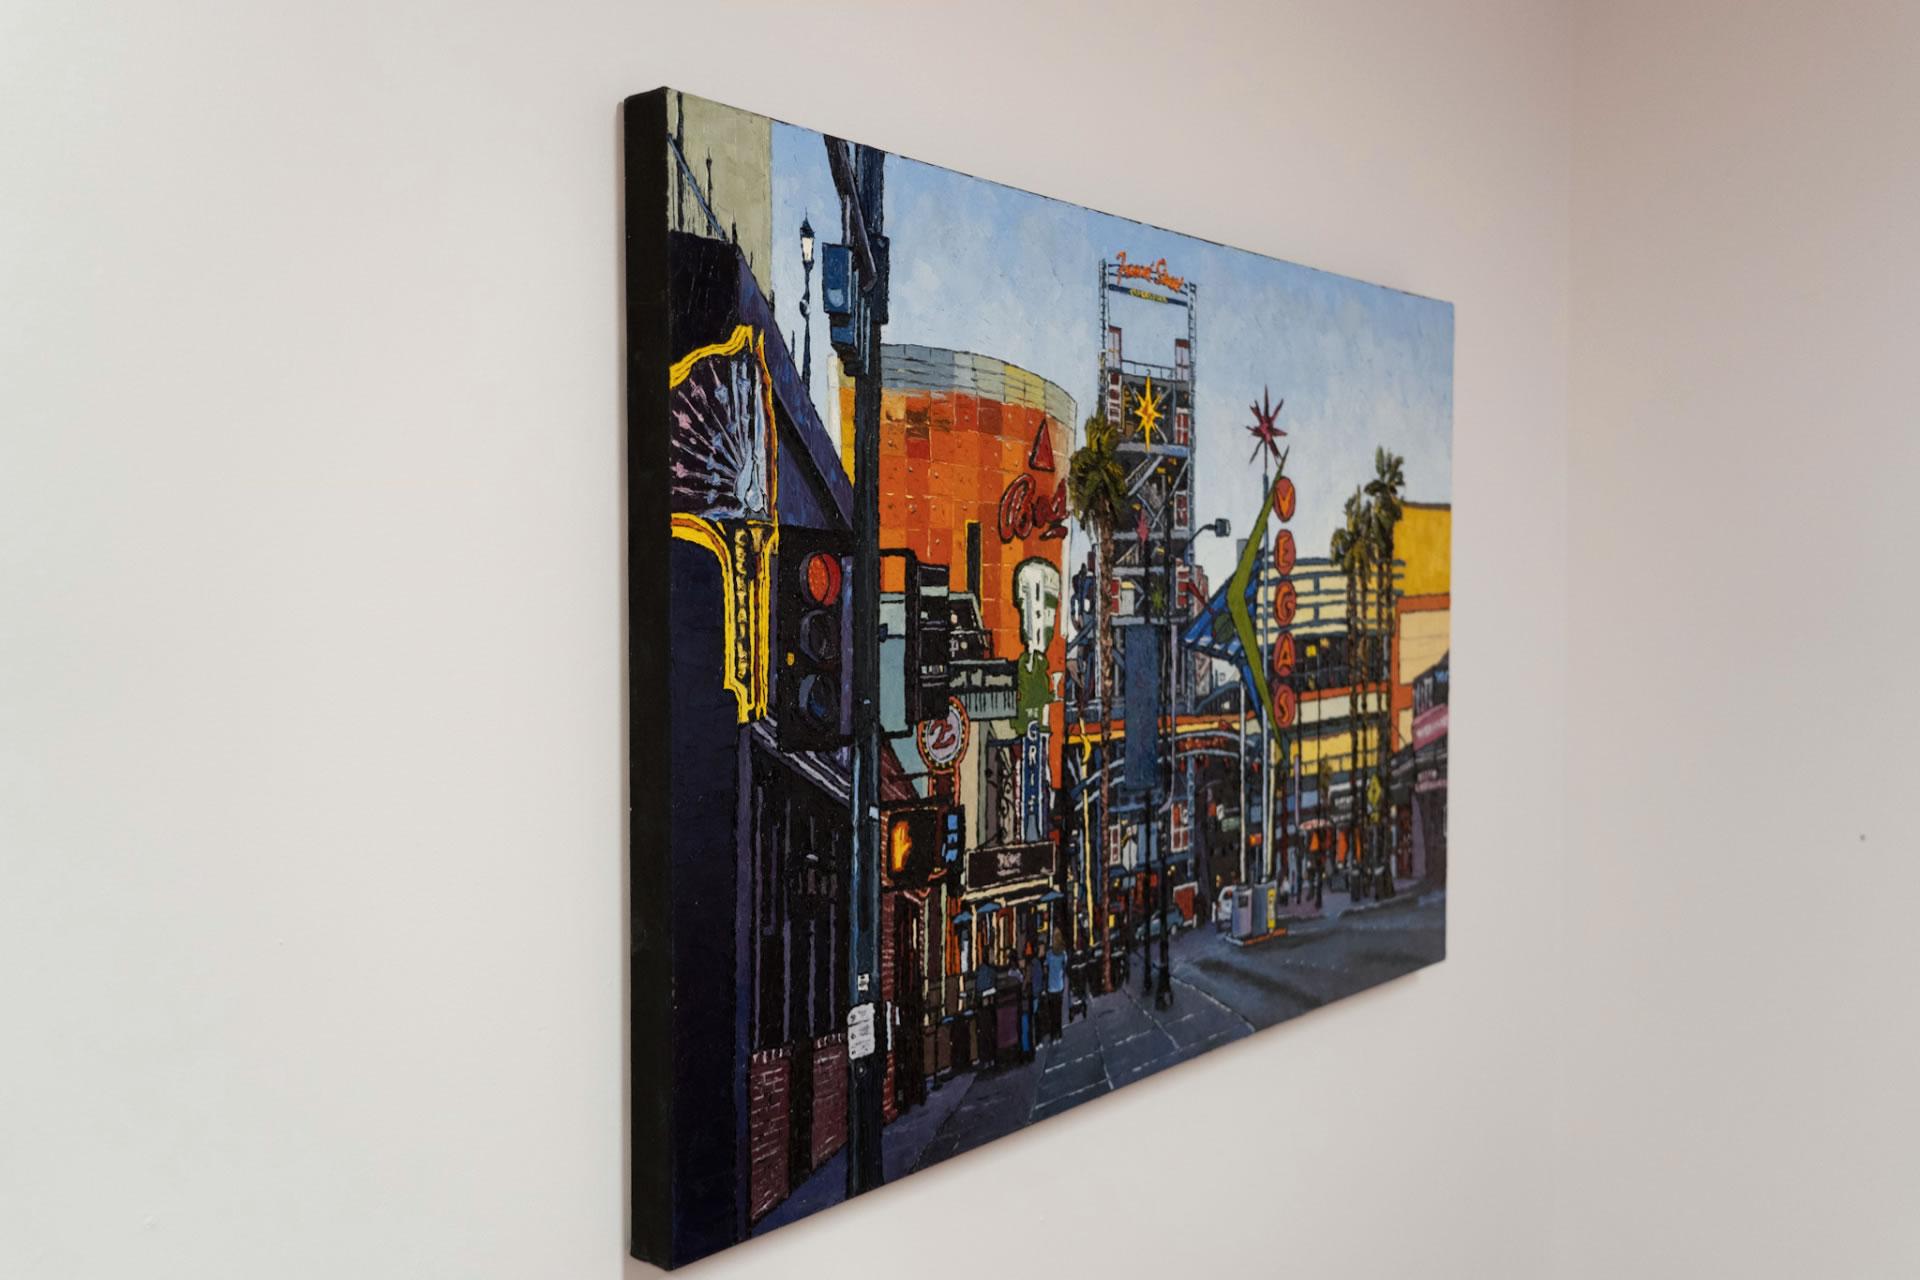 Emilie-Fantuz-Drifters-and-Dreamers-oil-on-canvas-30x48-2020-3900-Side-Online-Art-Galleries